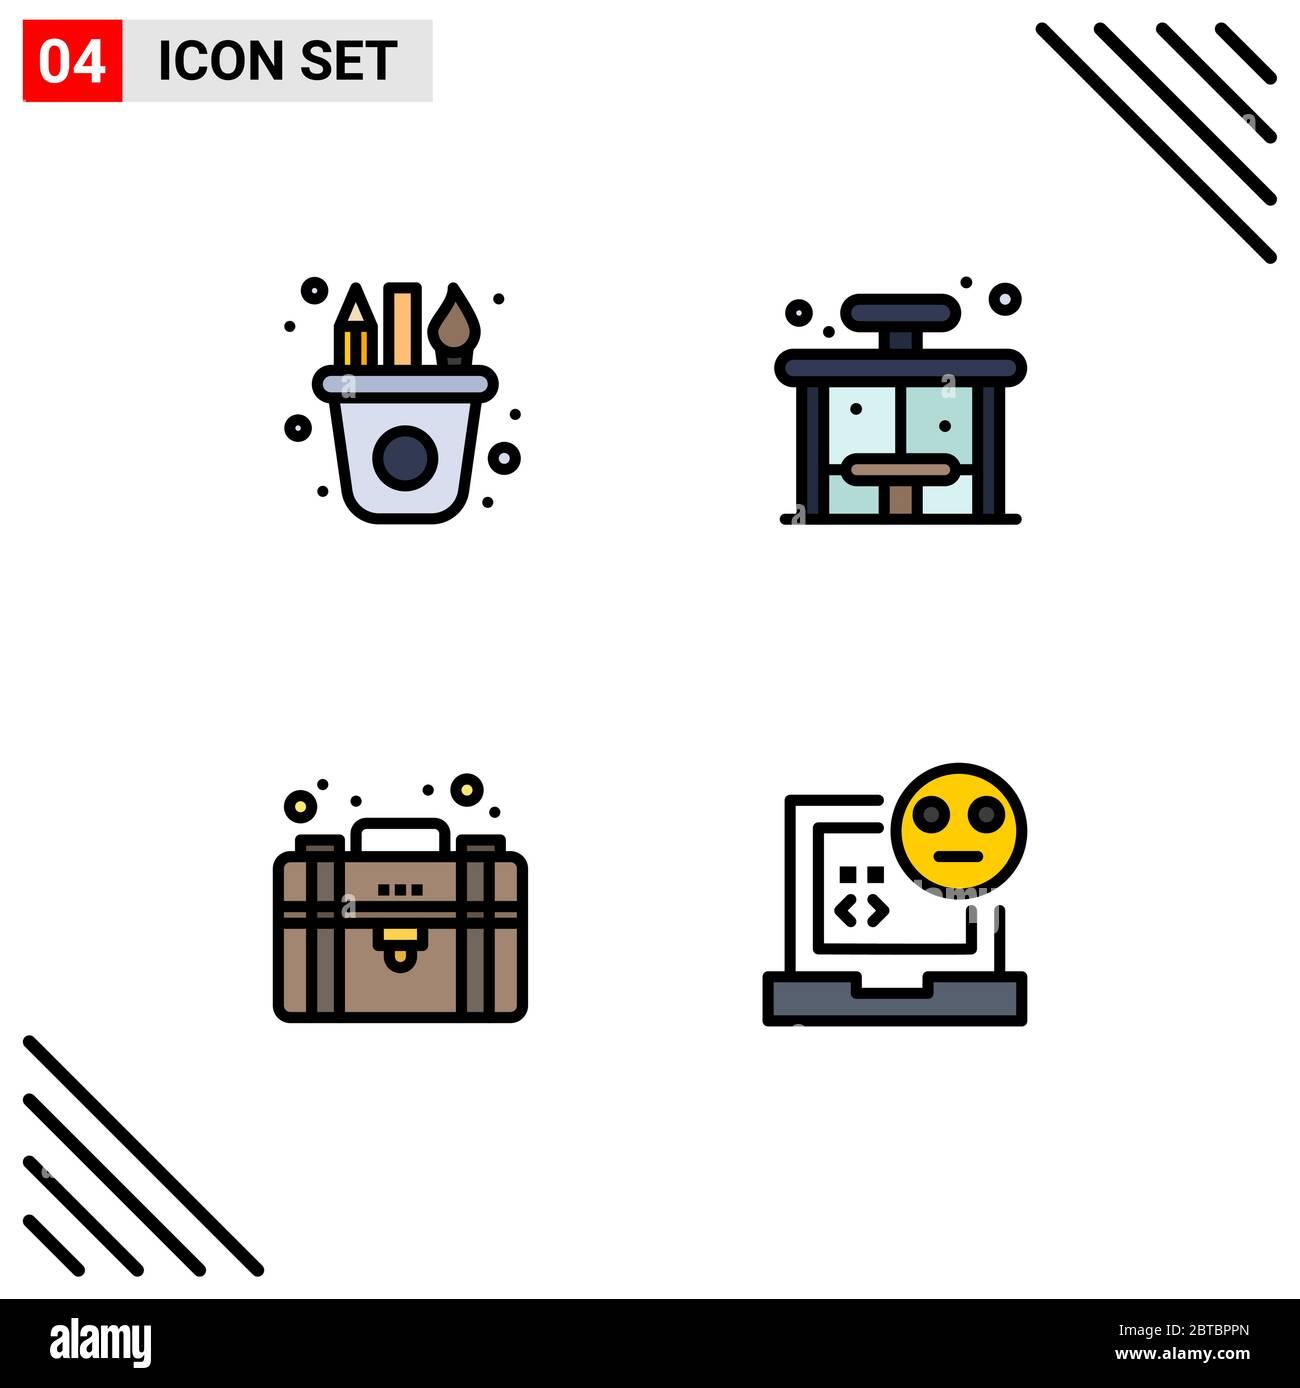 4 Filledline Flat Color Concept For Websites Mobile And Apps Art Equity Craft Bus Private Editable Vector Design Elements Stock Vector Image Art Alamy,Funeral Program Design